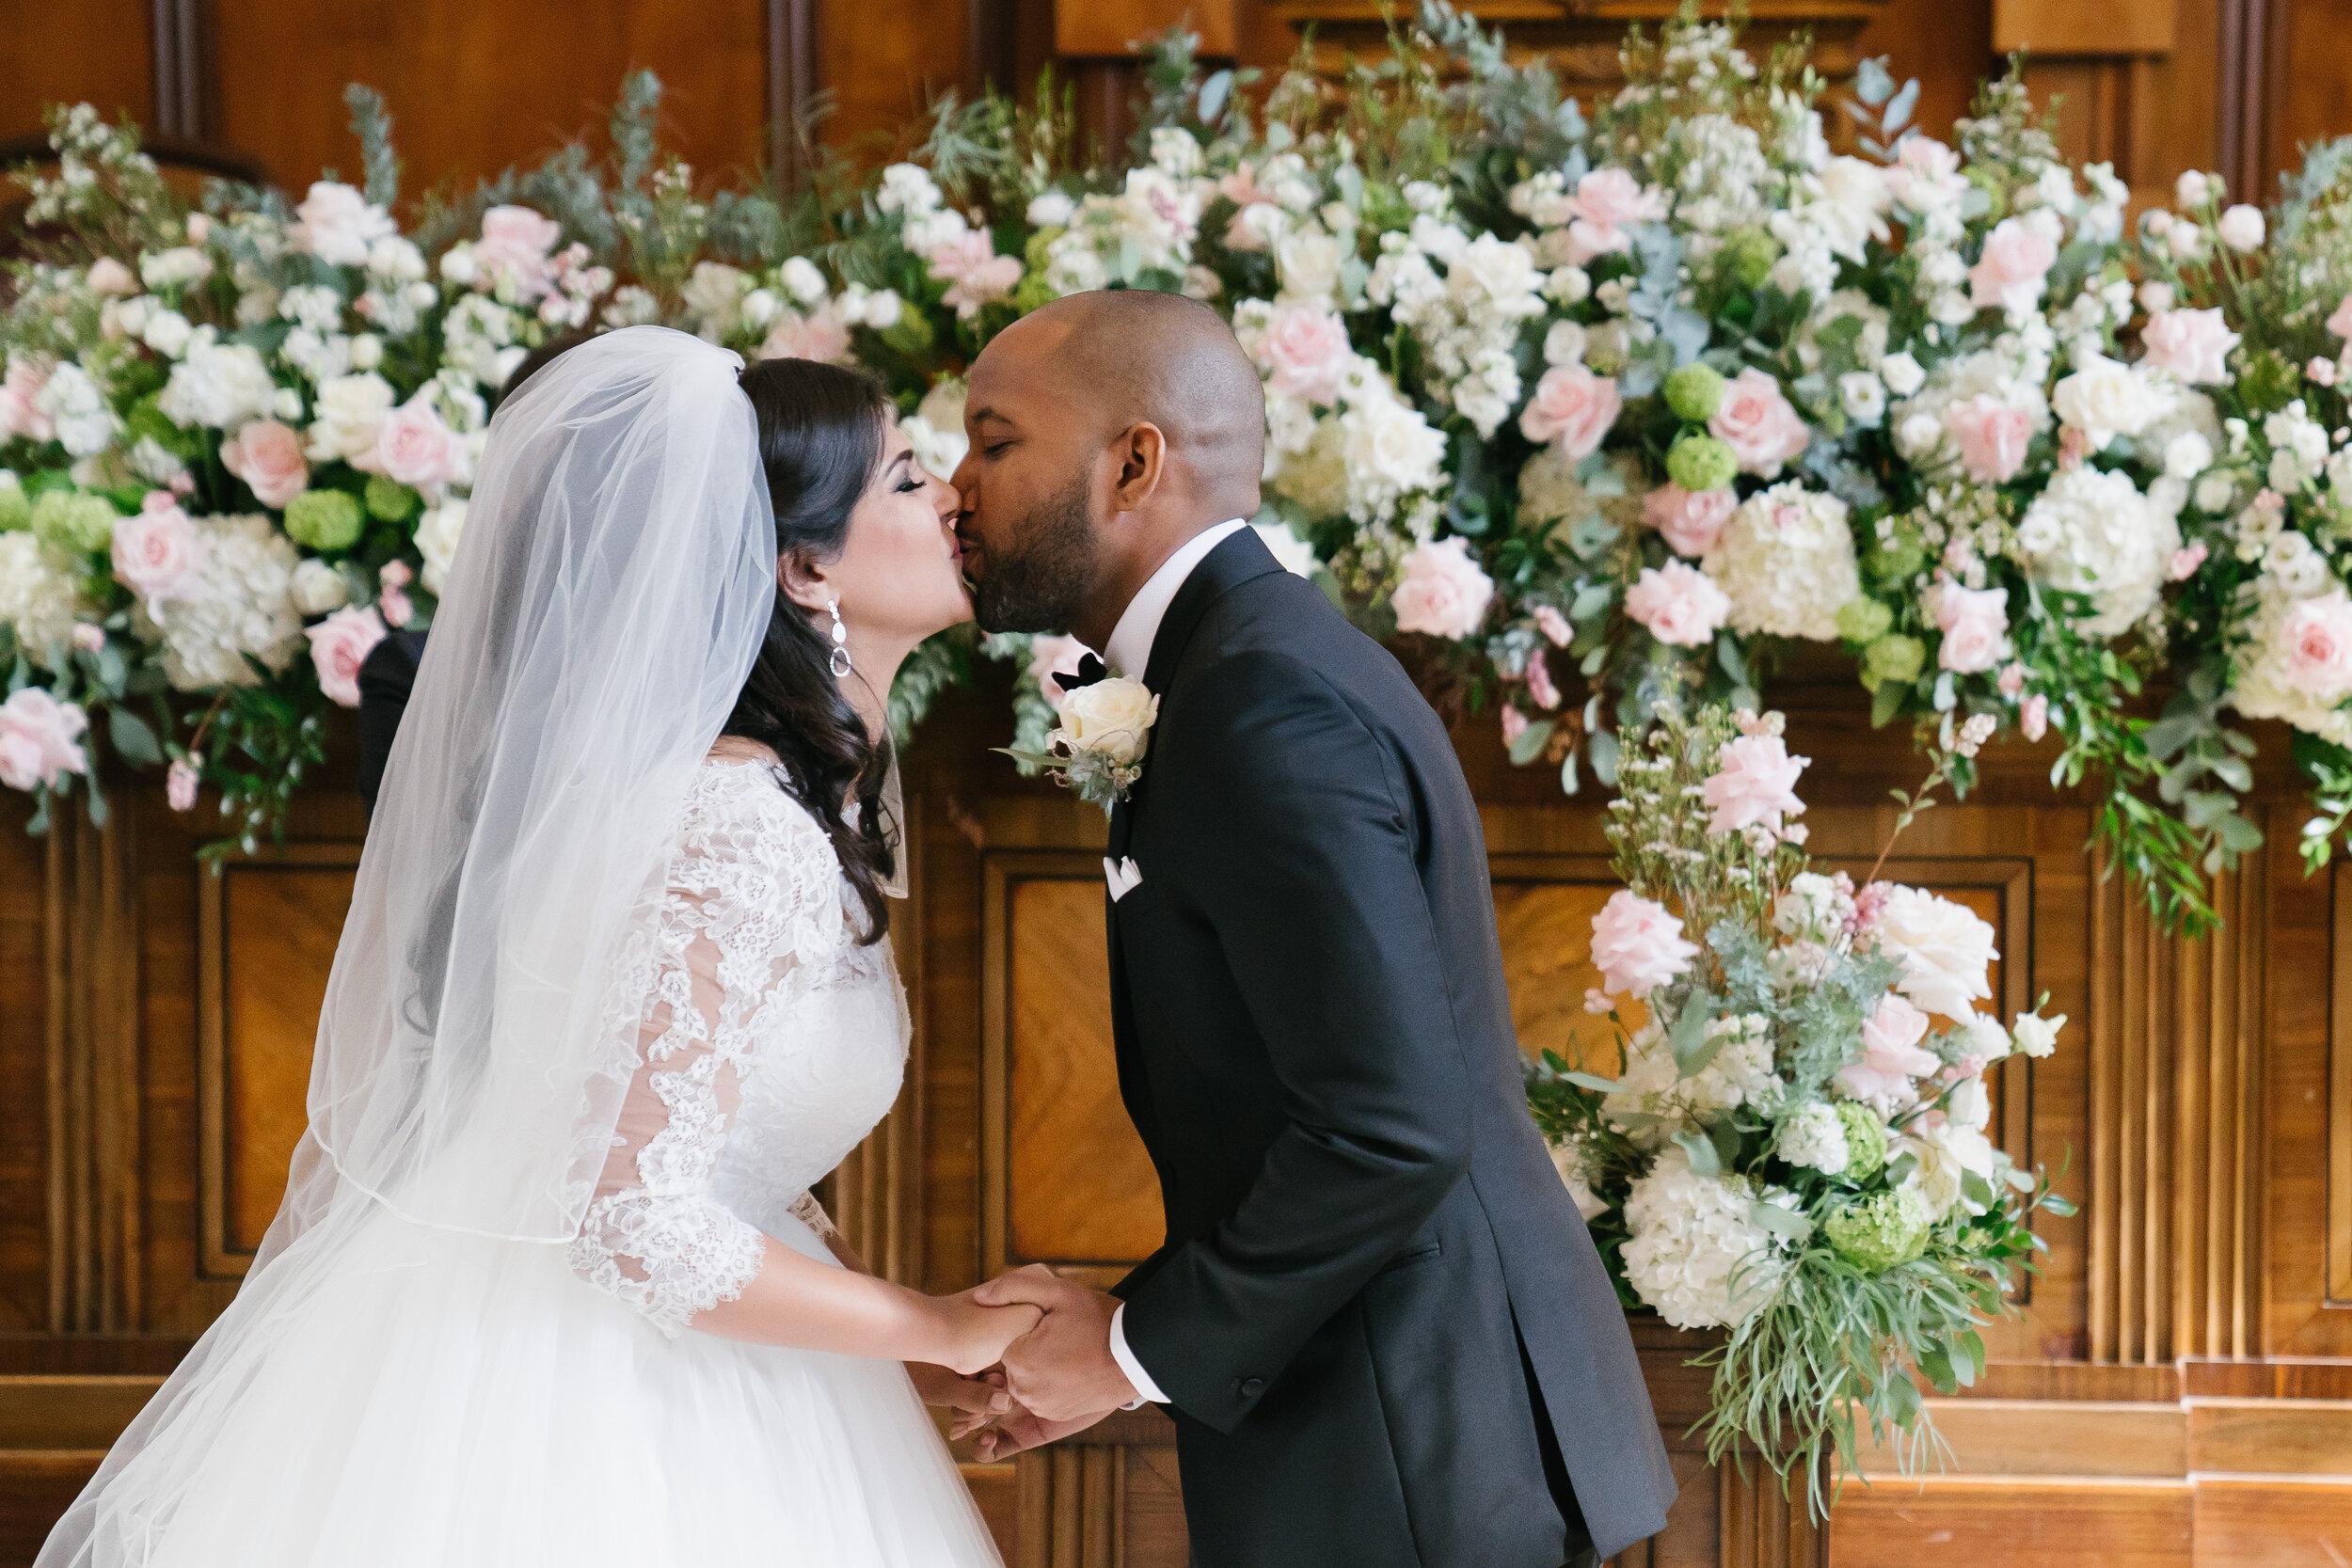 east-london-wedding-photographer-videographer-patriot-square-apartments-38